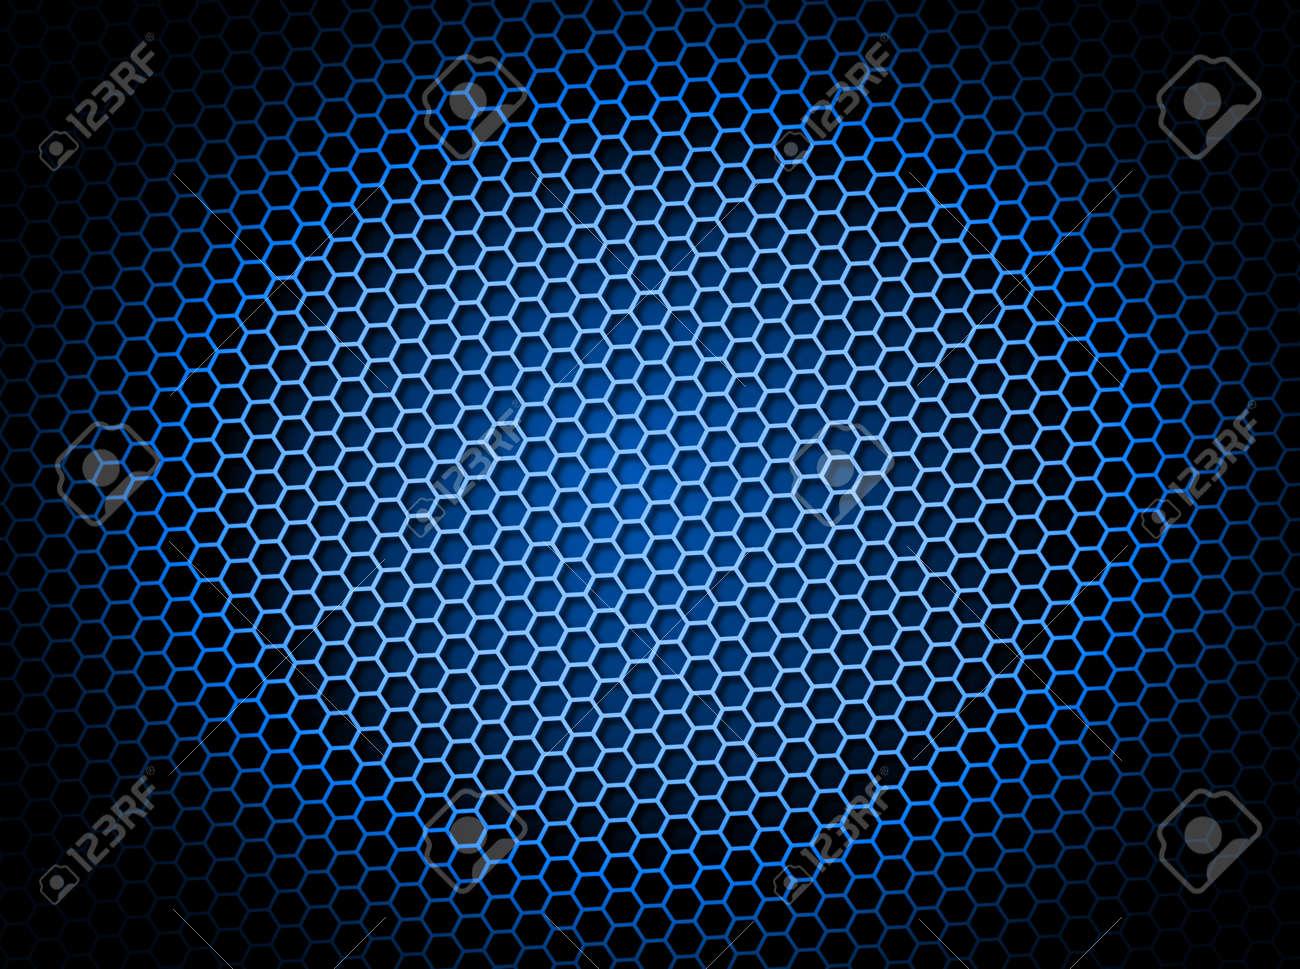 Blue honeycomb background 3d illustration or backdrop with light effect Stock Illustration - 5535295